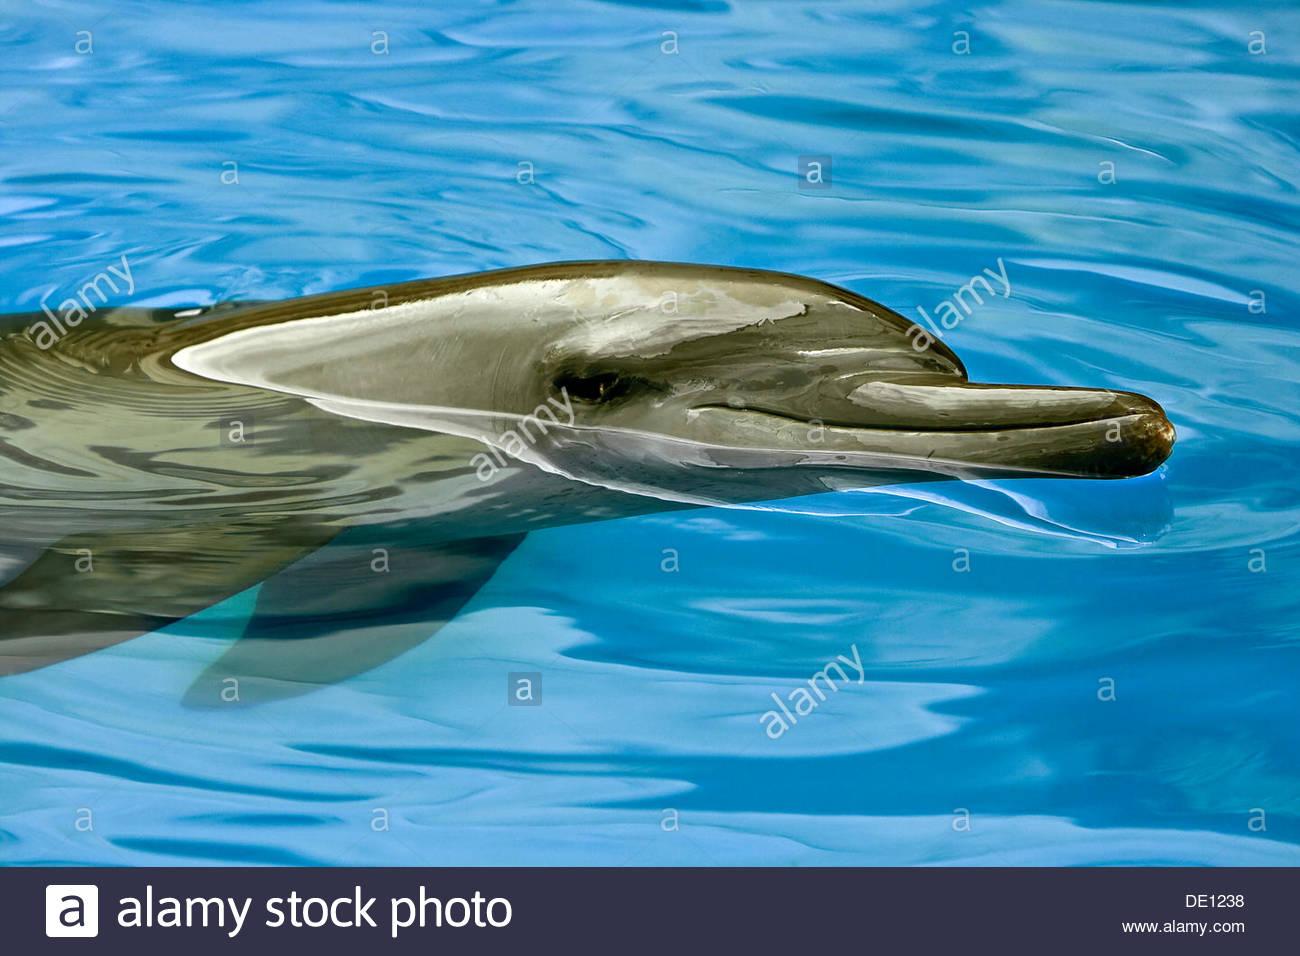 Dolphin (Delphinidae) - Stock Image